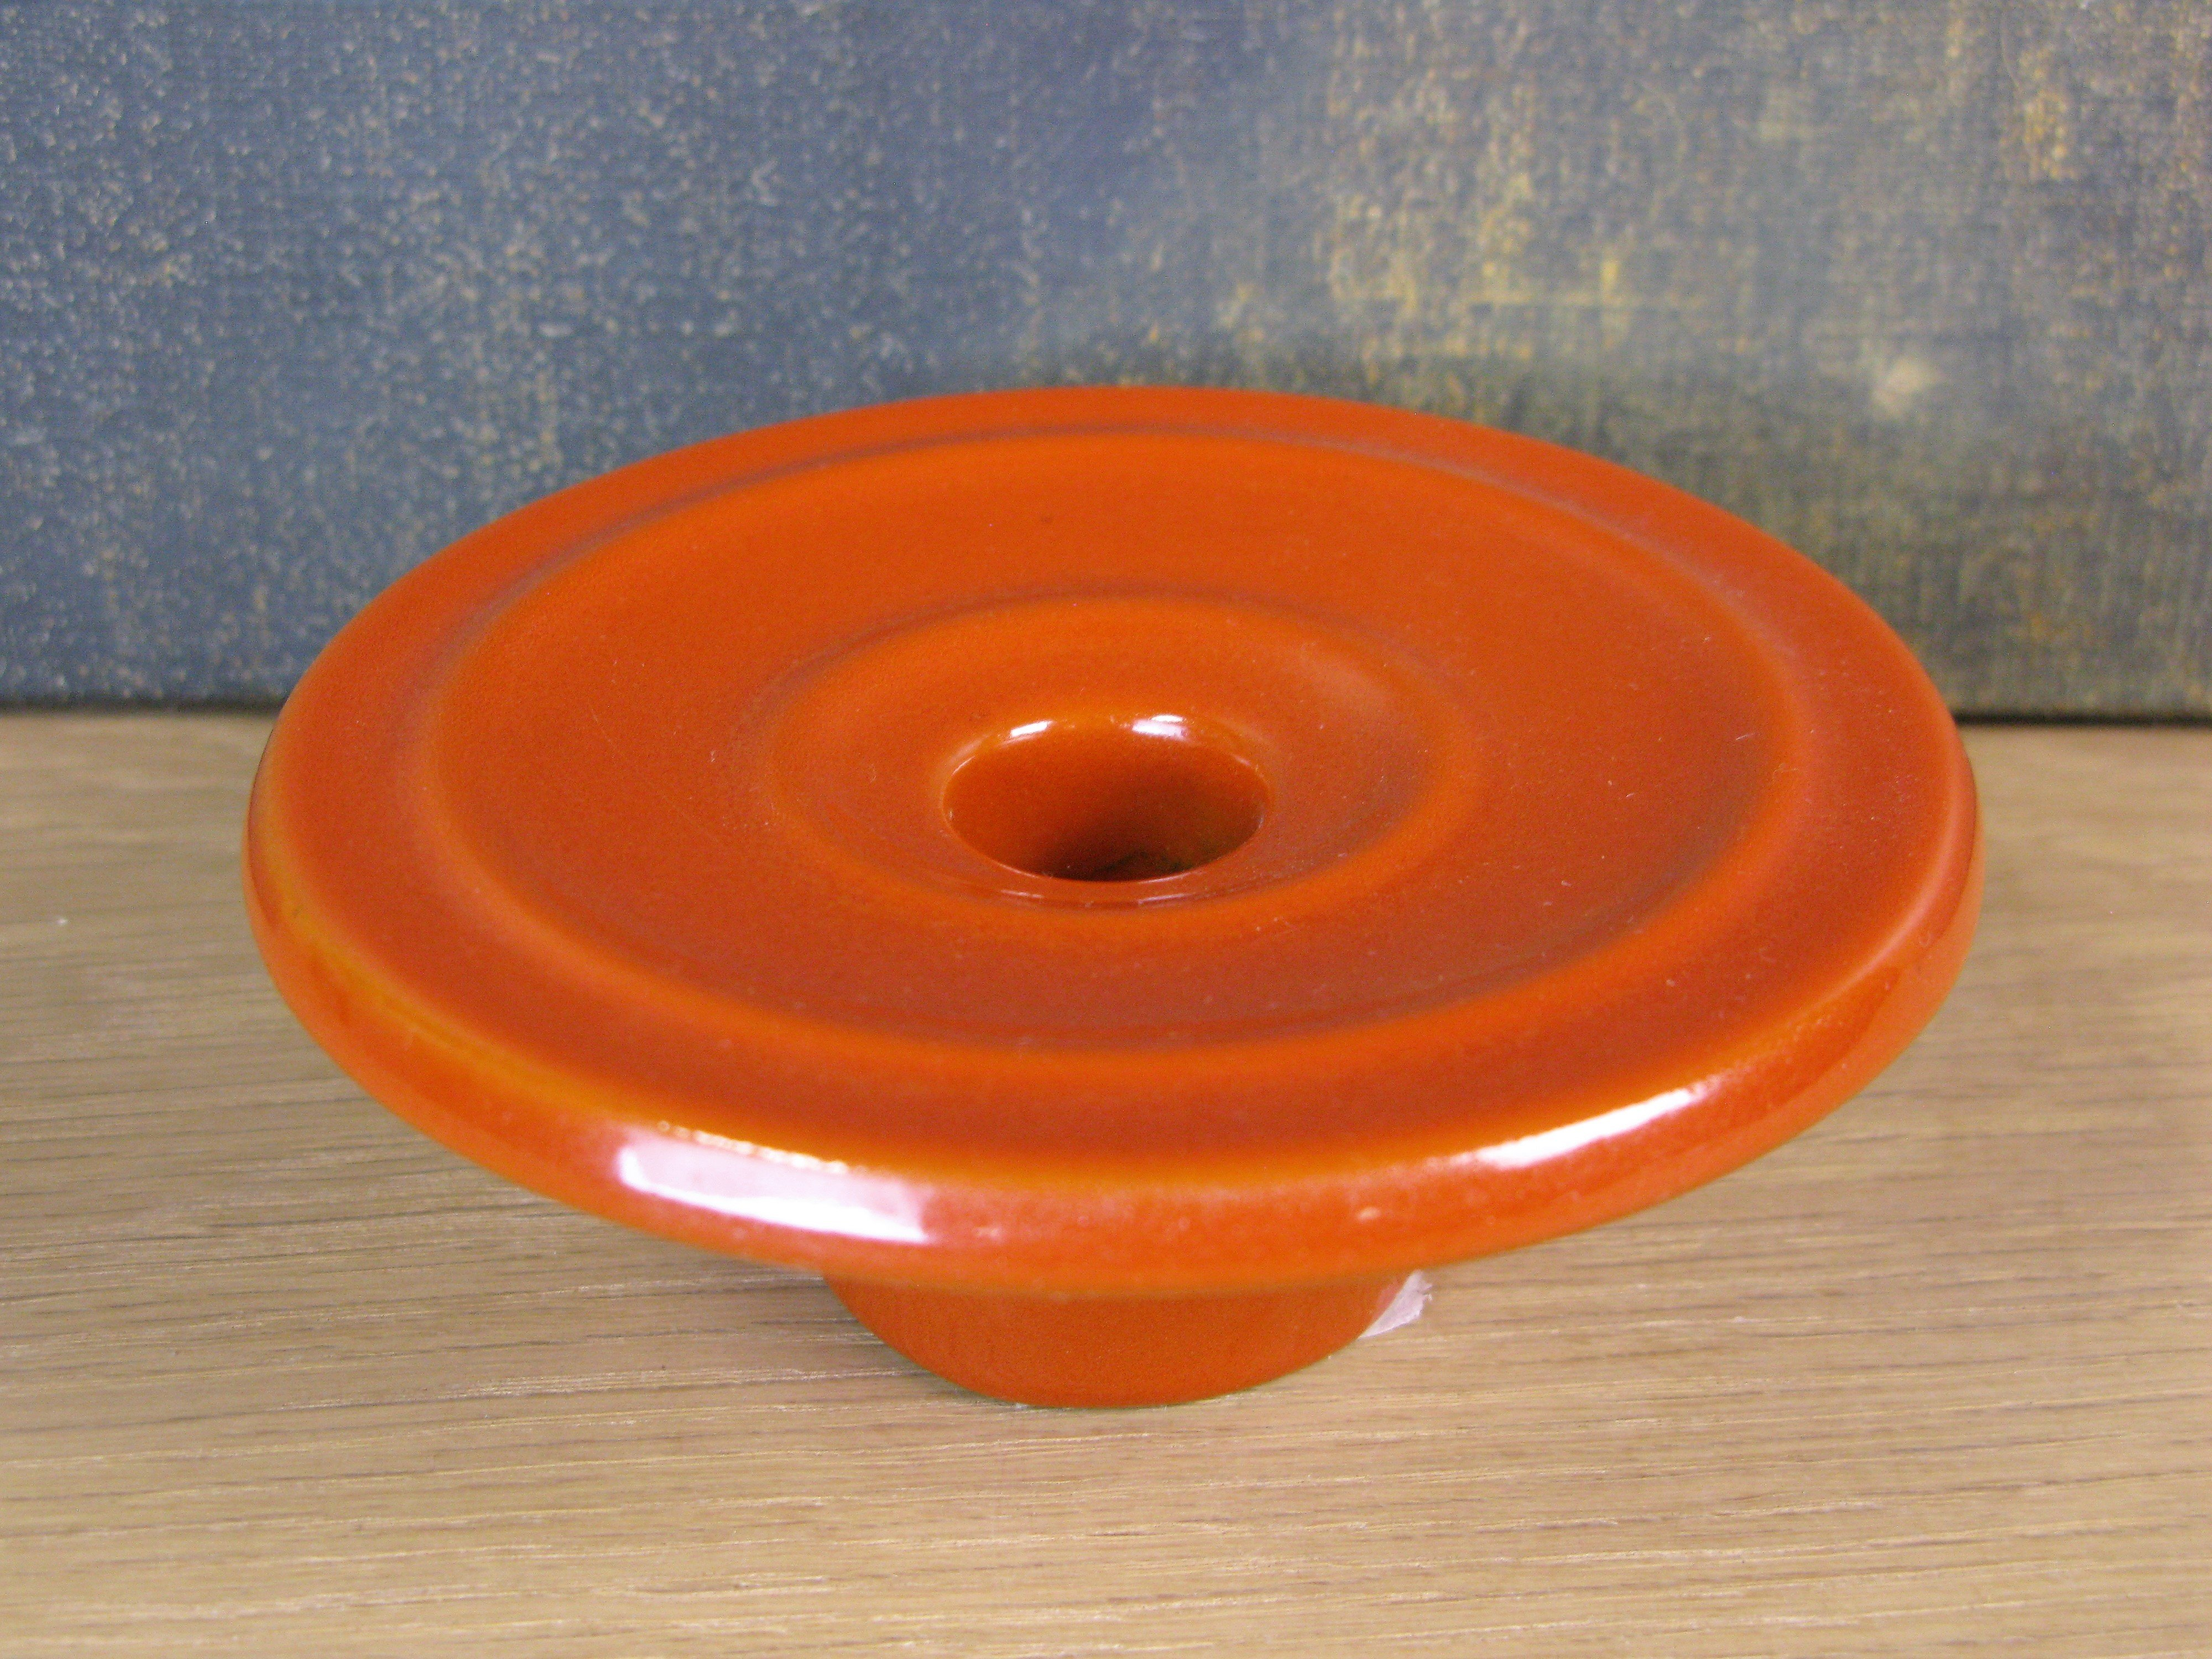 orange candlestick 8008m